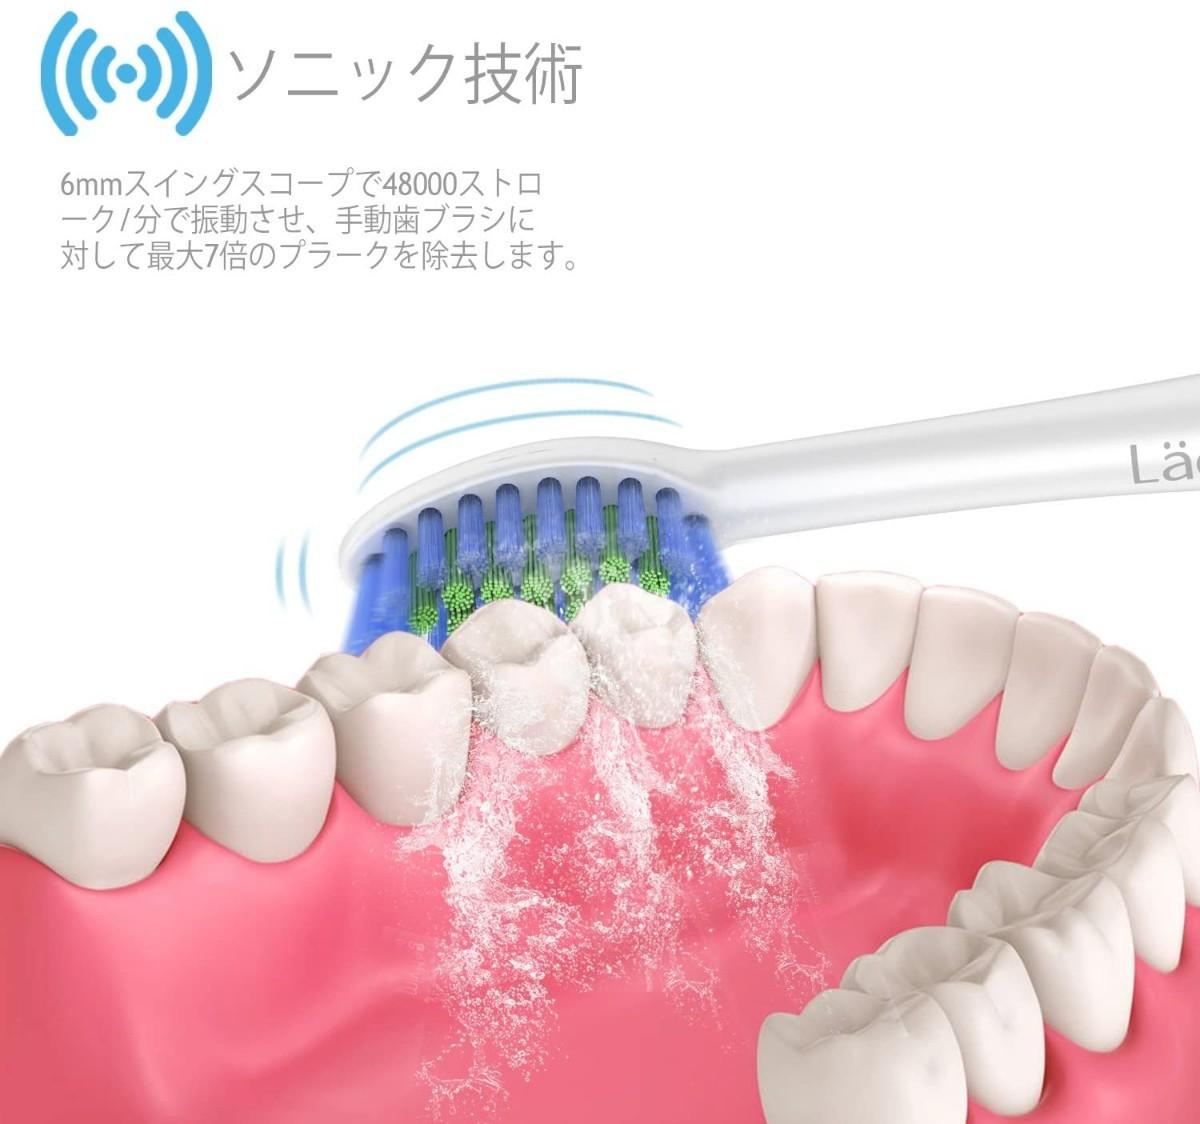 超音波電動歯ブラシ強度設定 USB充電式 高速充電 口腔ケア 防水 IPX7